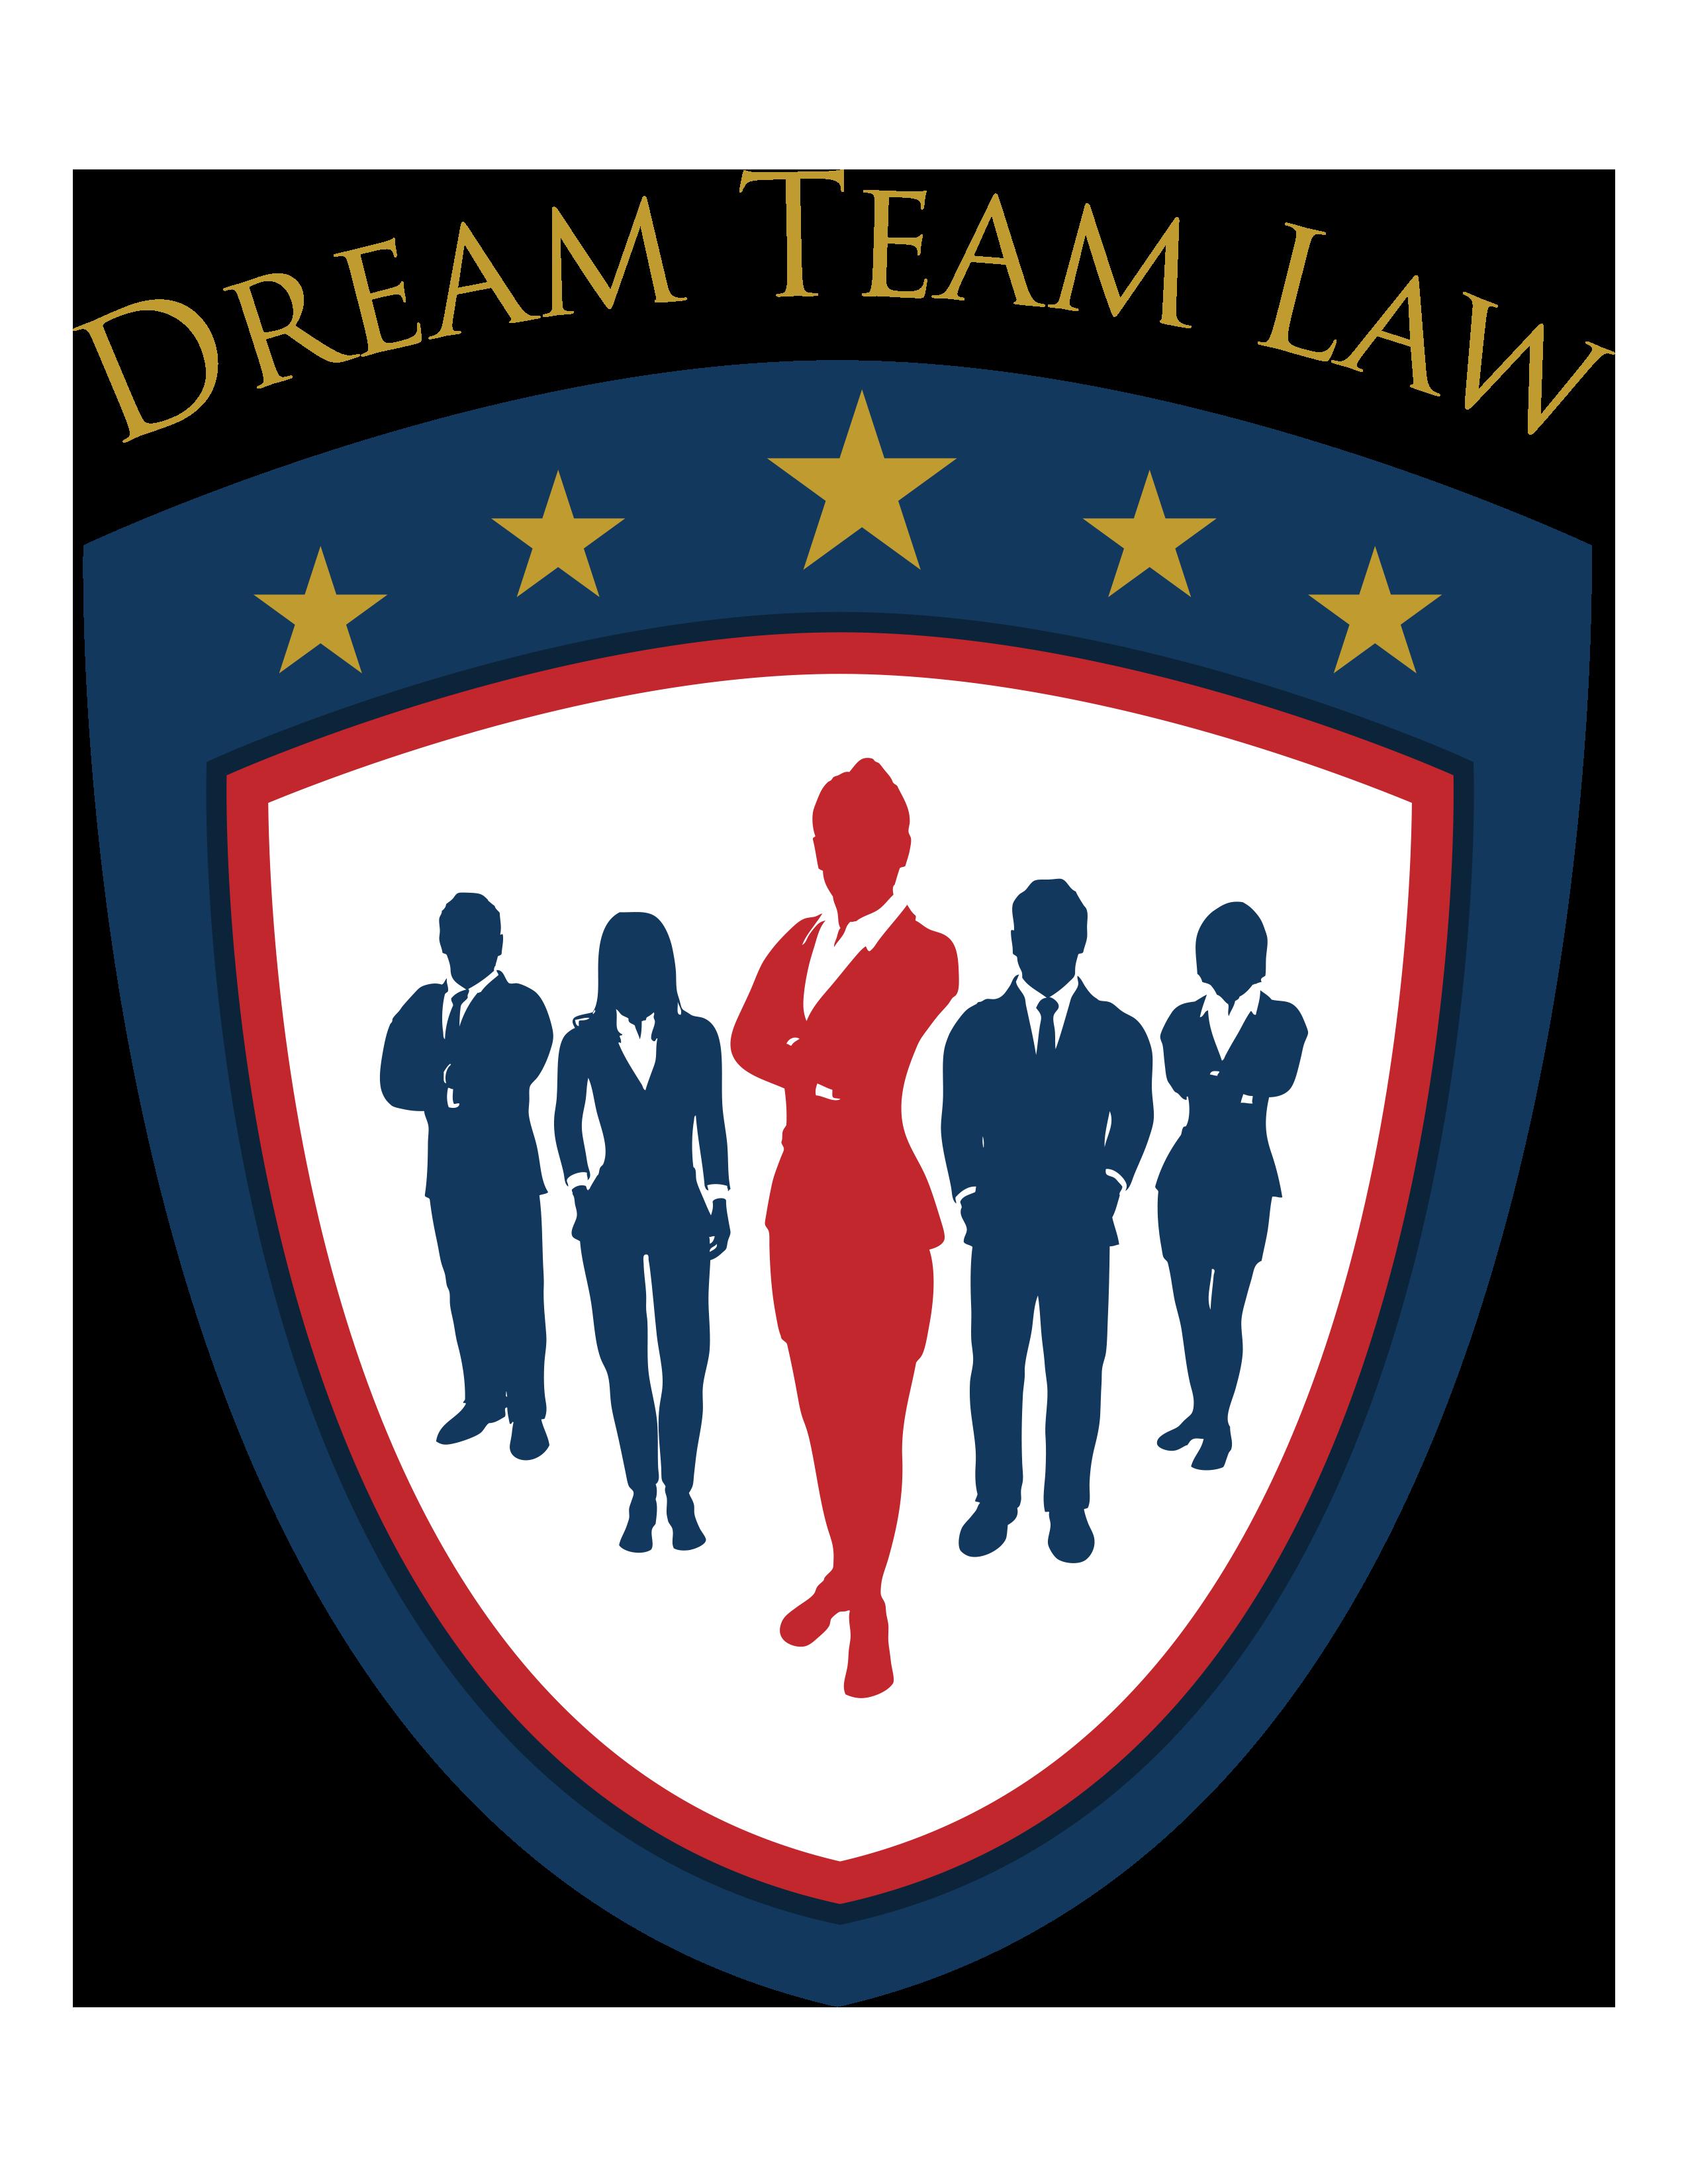 Dream Team Law - Florida